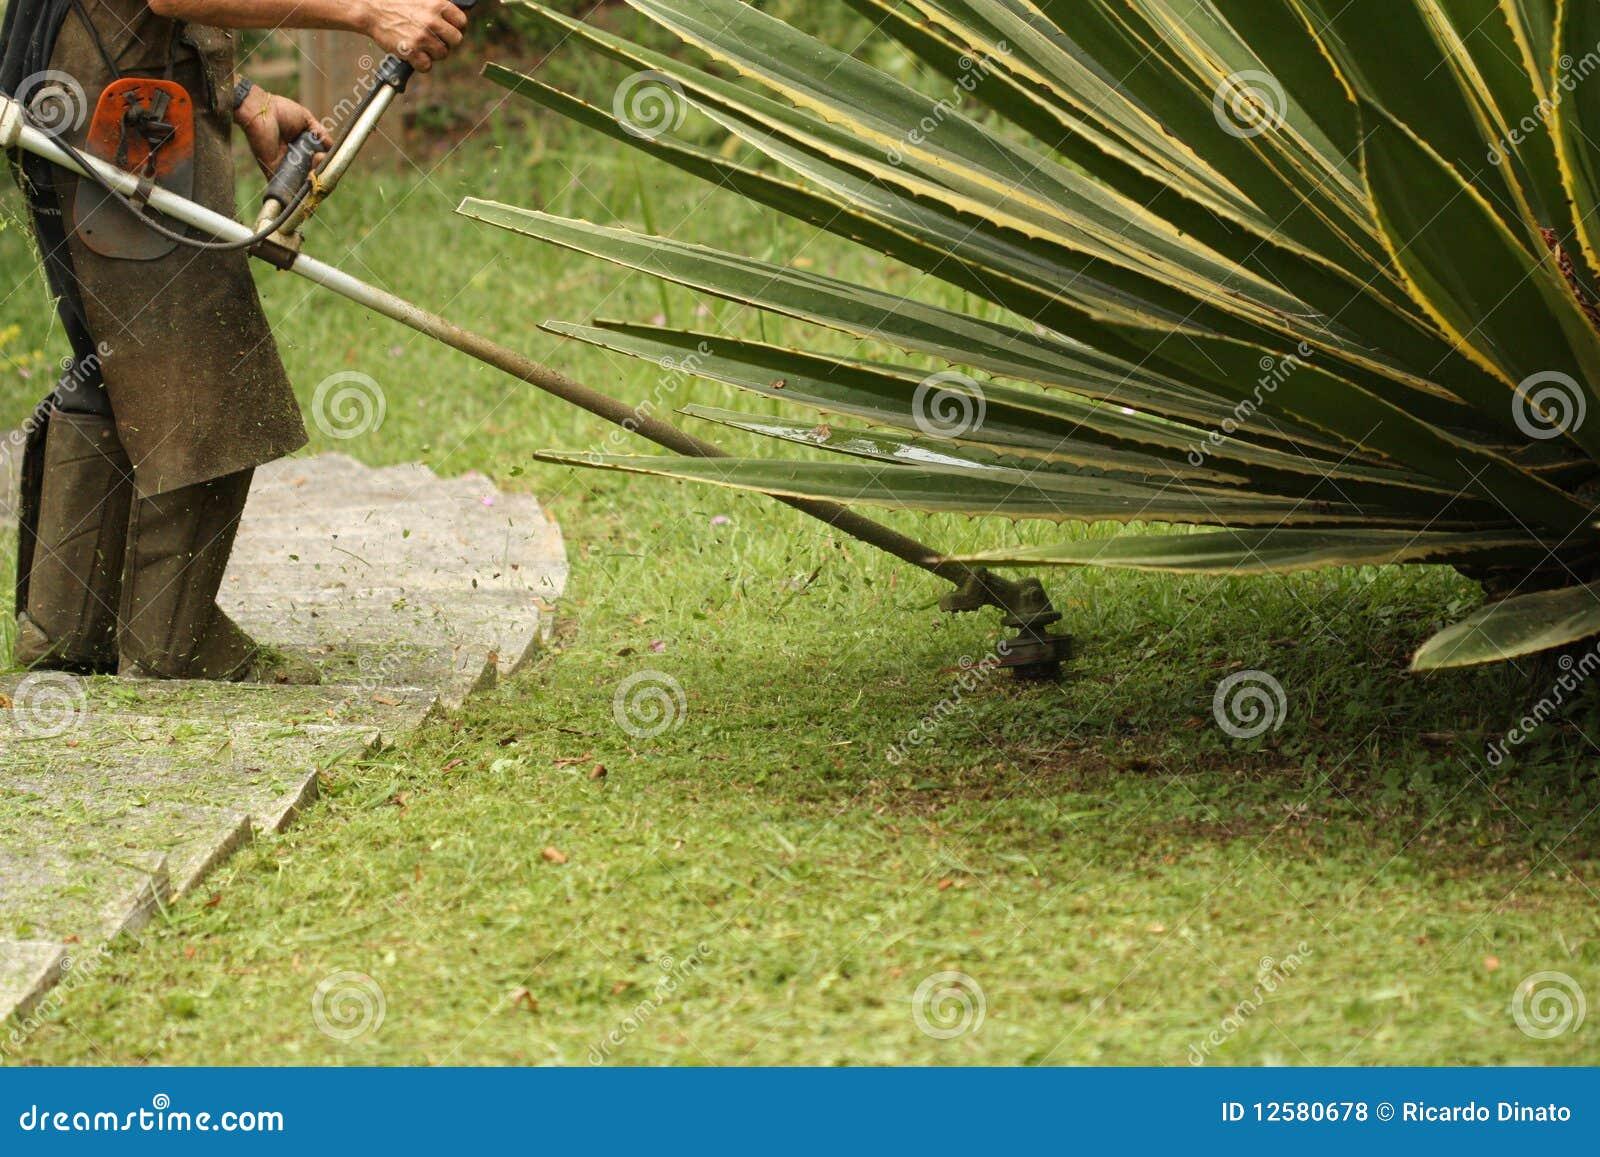 Cutting Grass Royalty Free Stock Photos - Image: 12580678